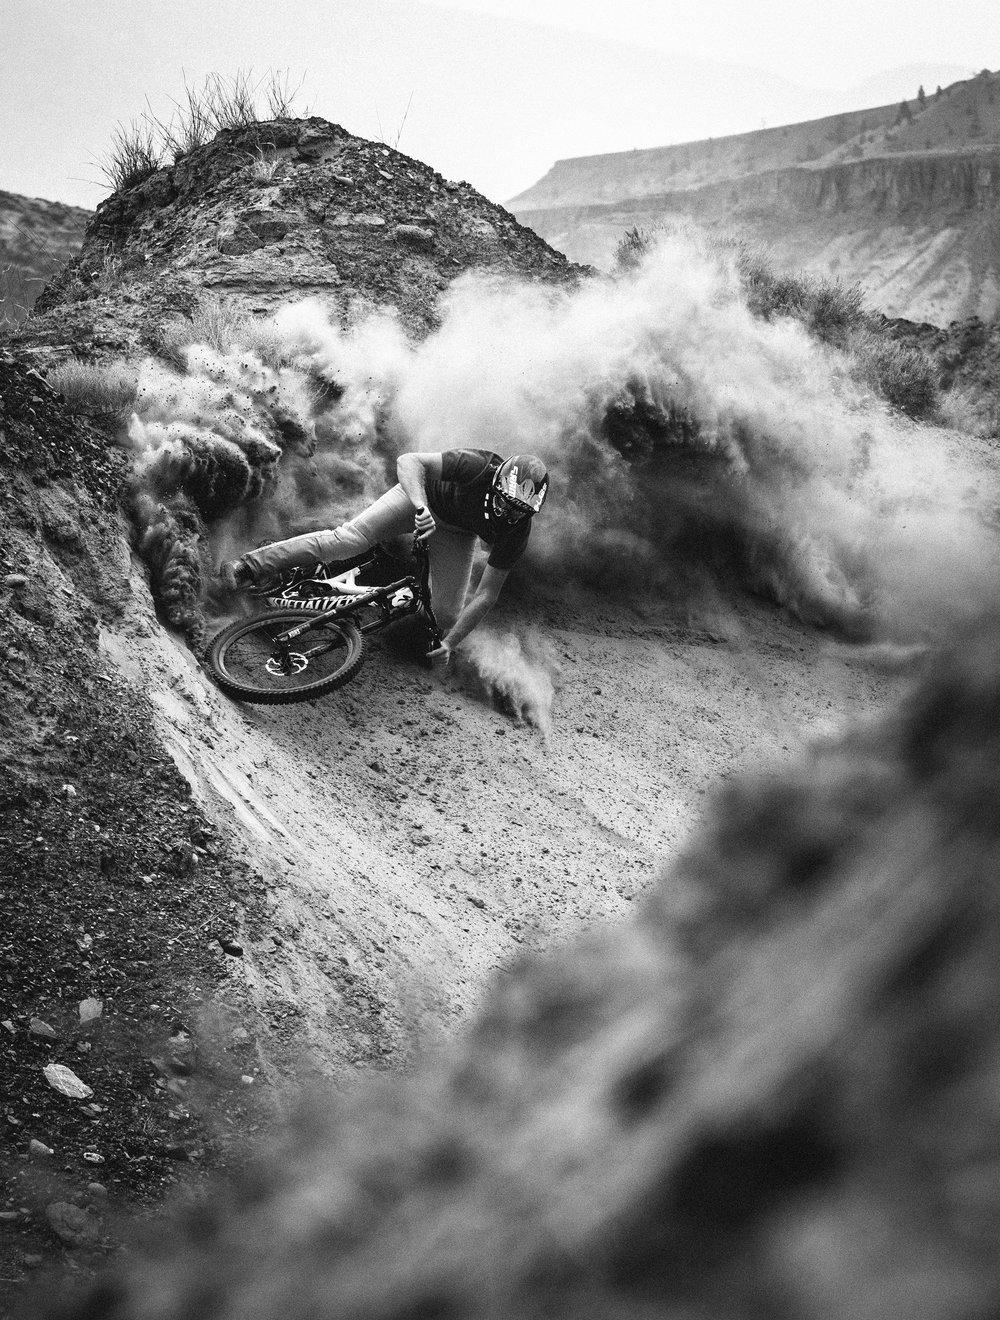 Kyle Norbraten   Fraser Canyon, BC